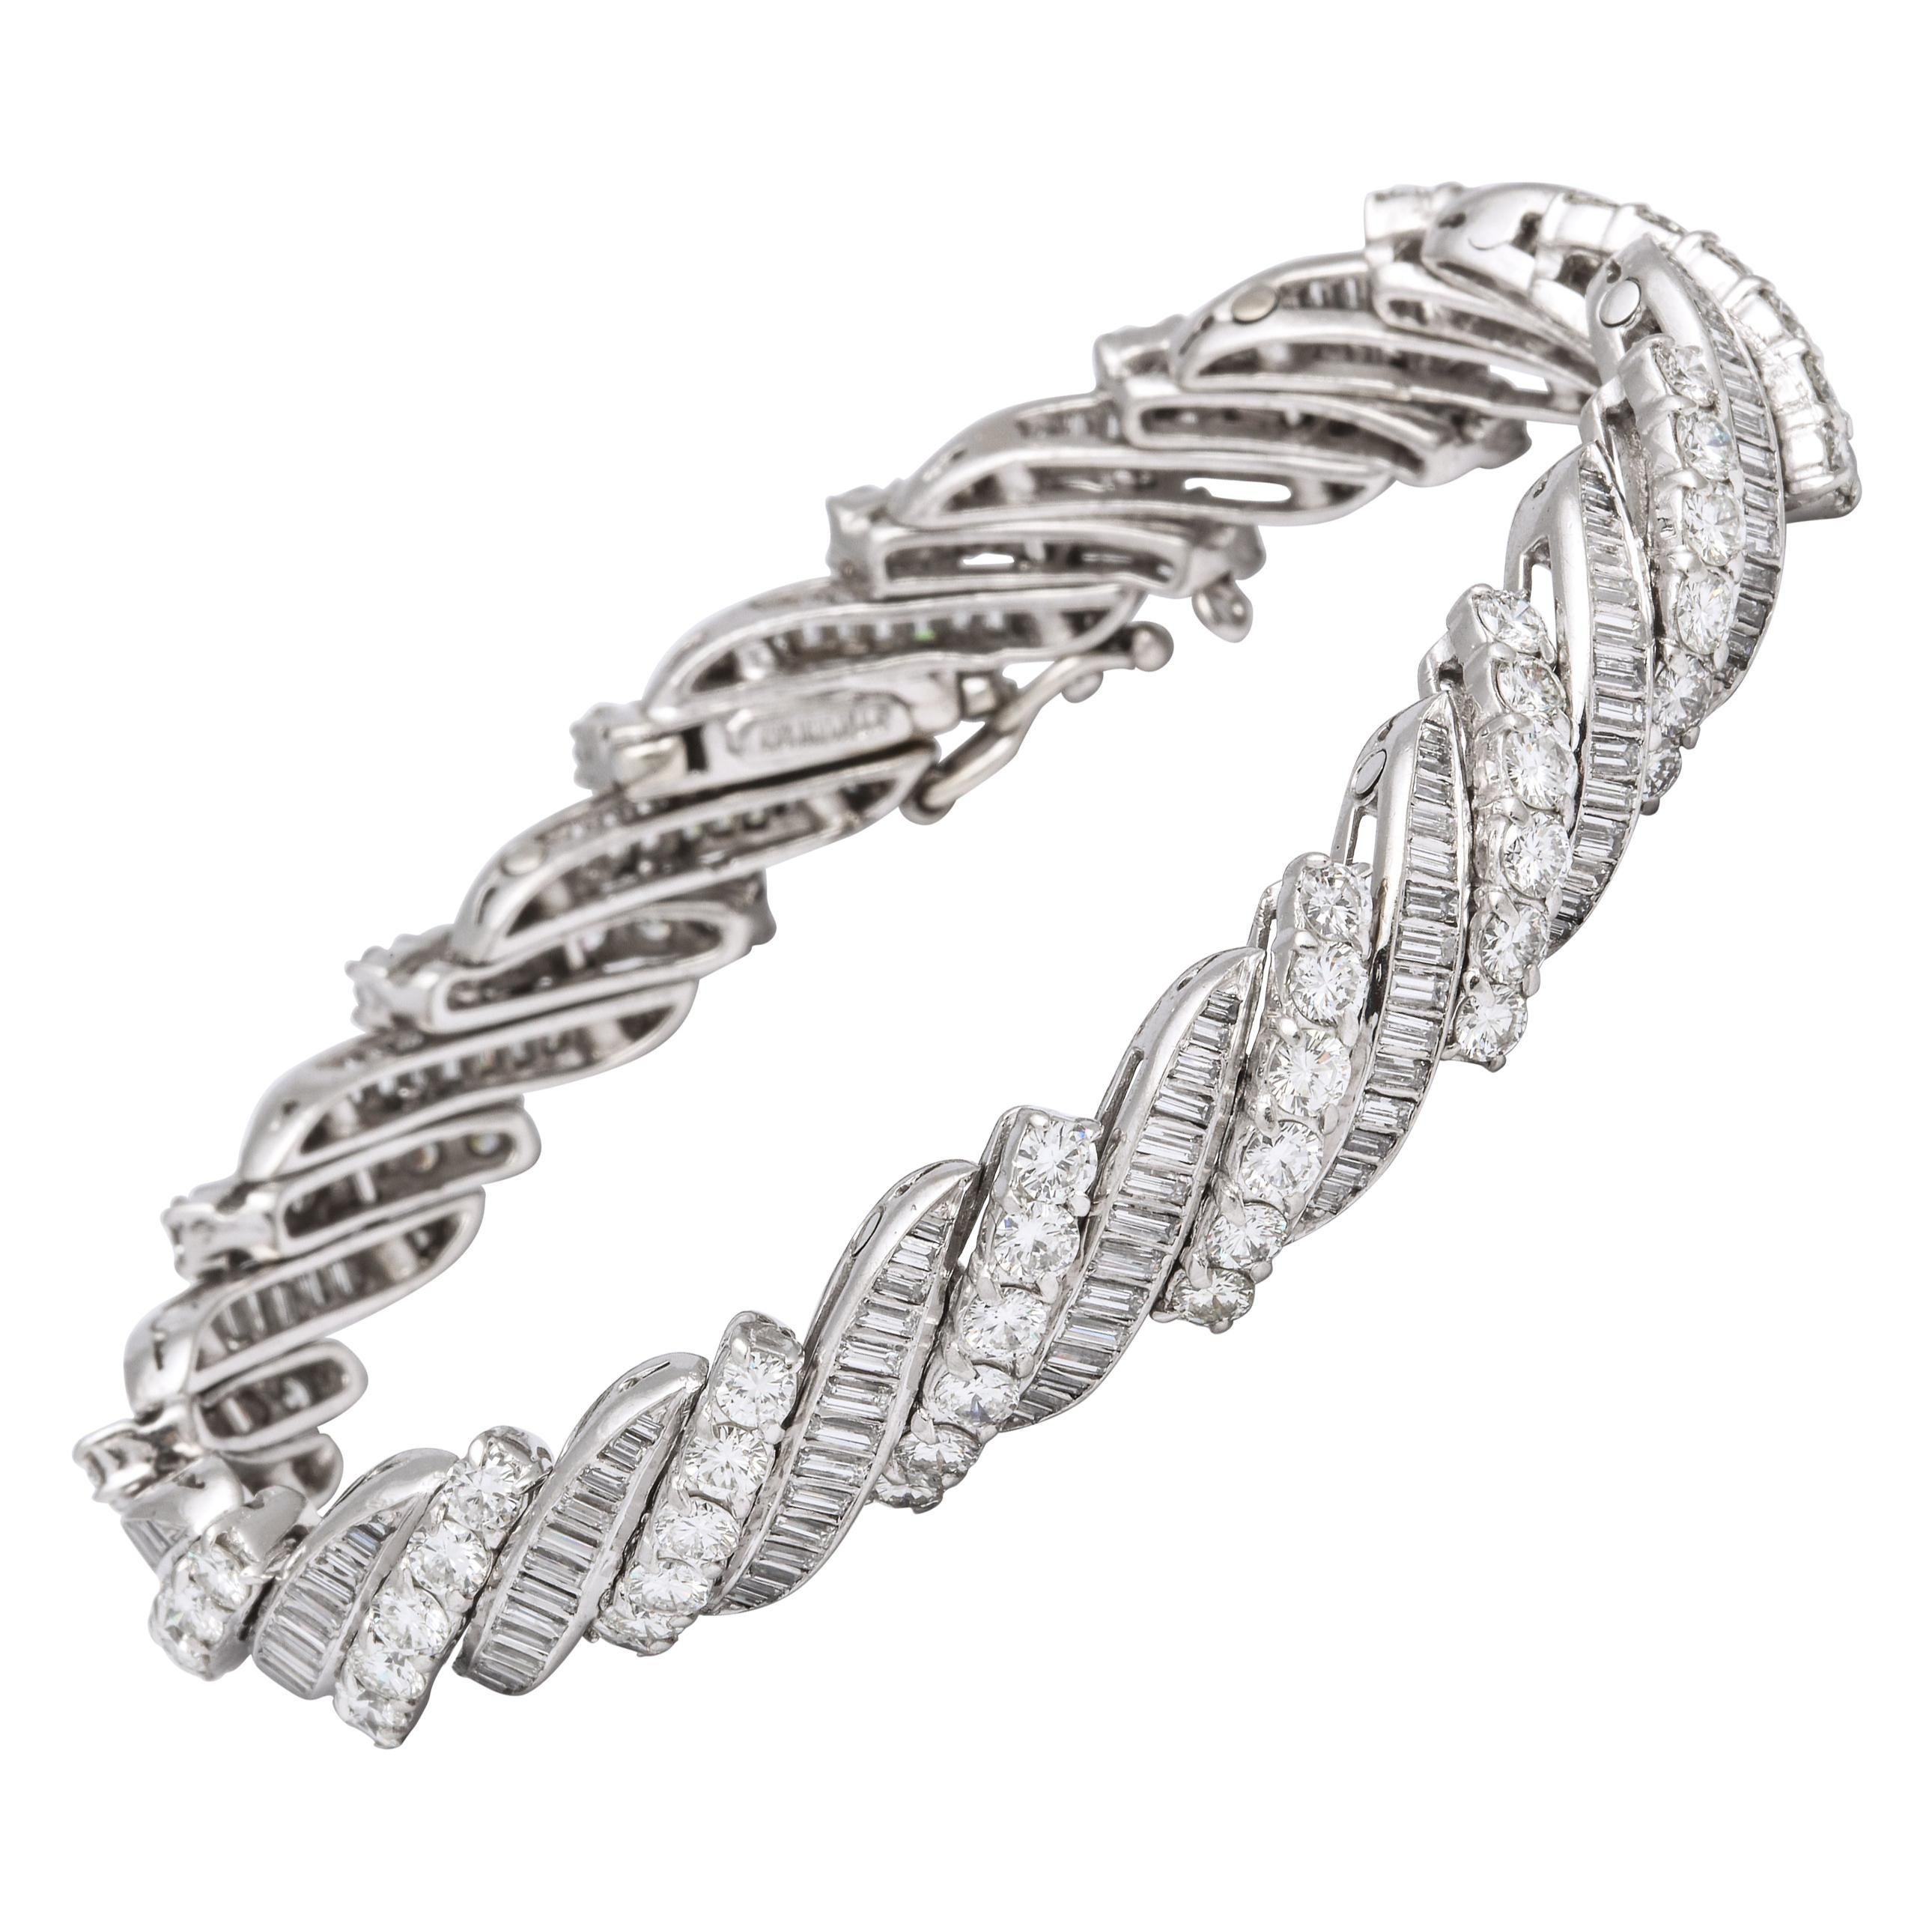 1950s Platinum Baguette Tennis Bracelet Unisex